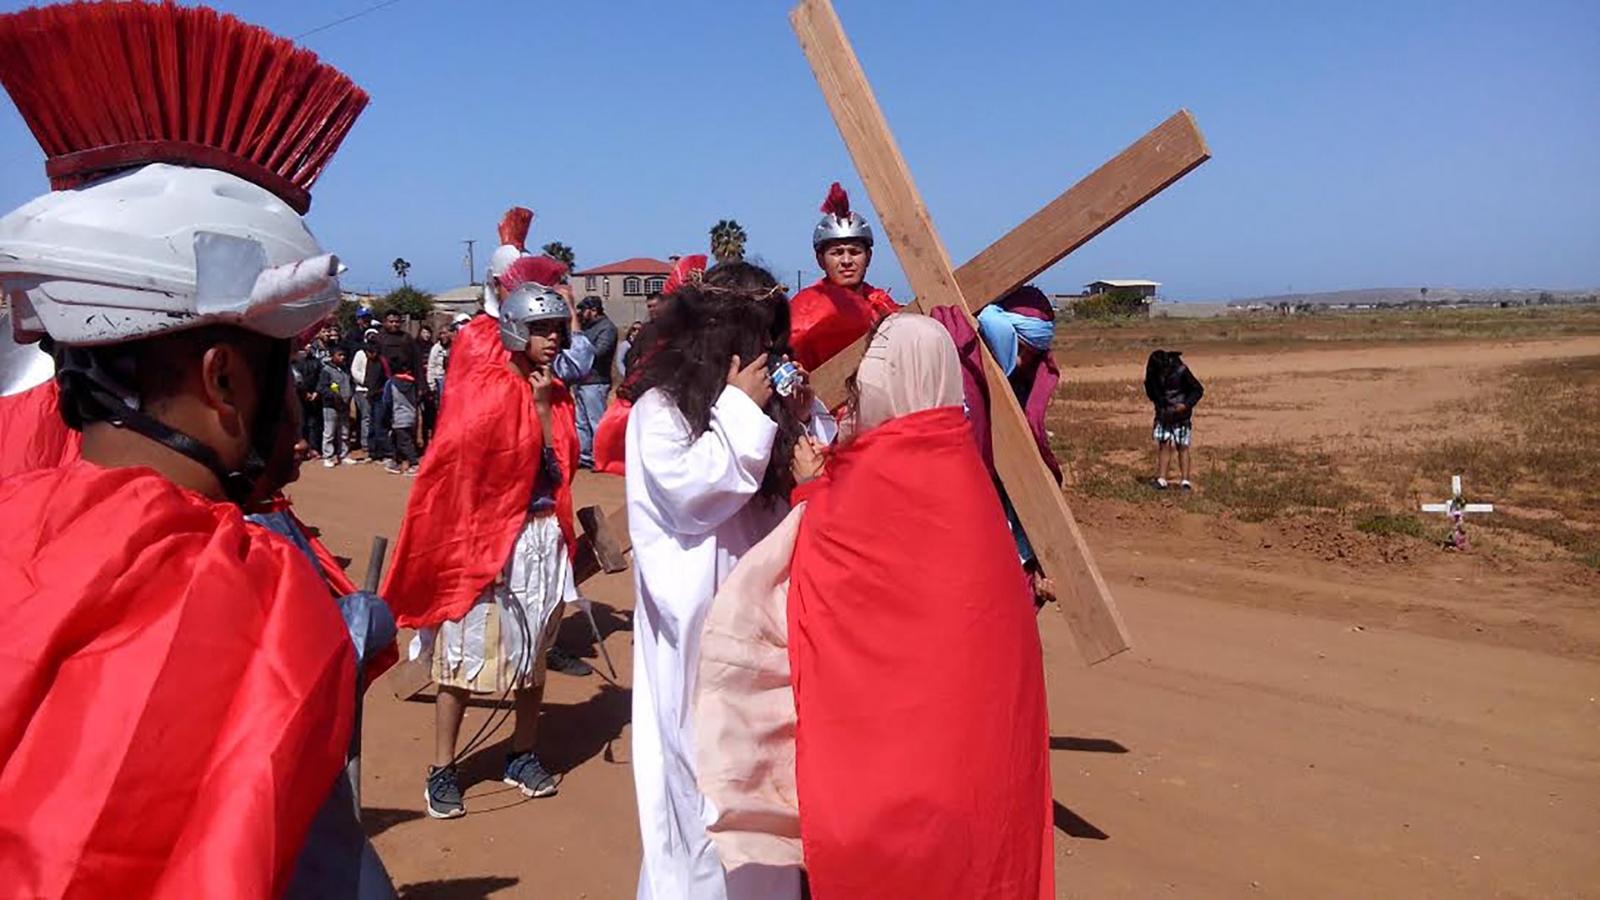 Espectador golpea a un soldado romano para salvar a Jesús en Brasil